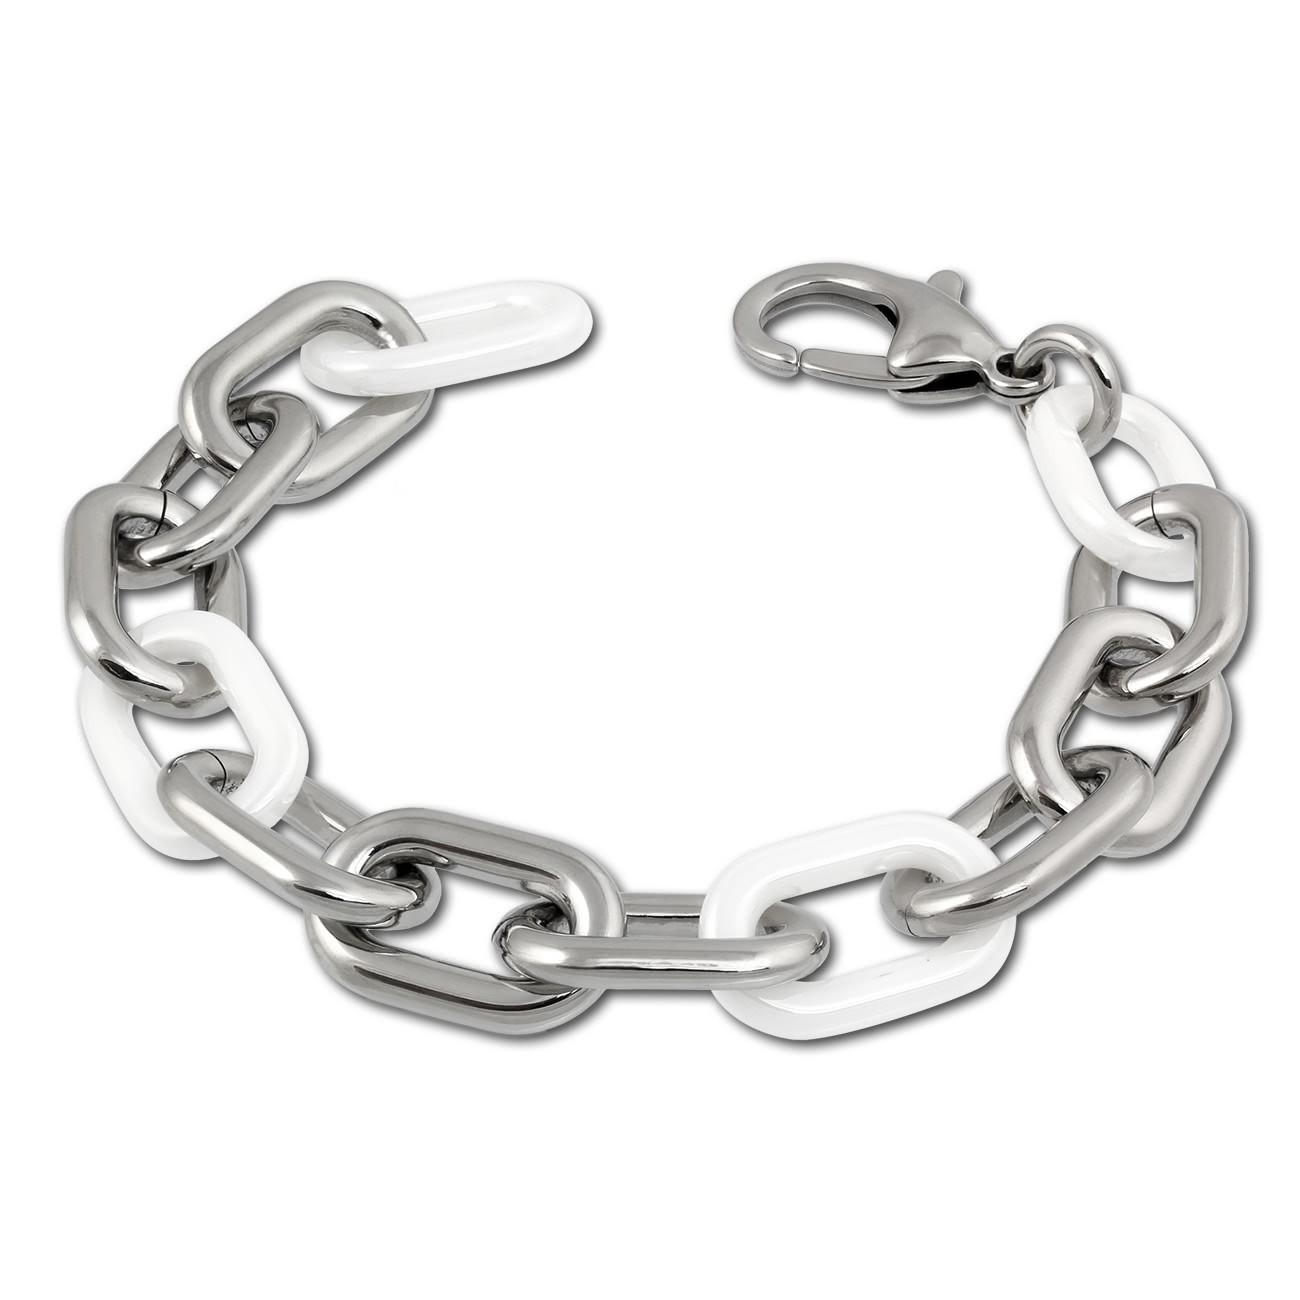 Amello Armband Keramik grobe Glieder weiß Damen Edelstahlschmuck ESAX19W9